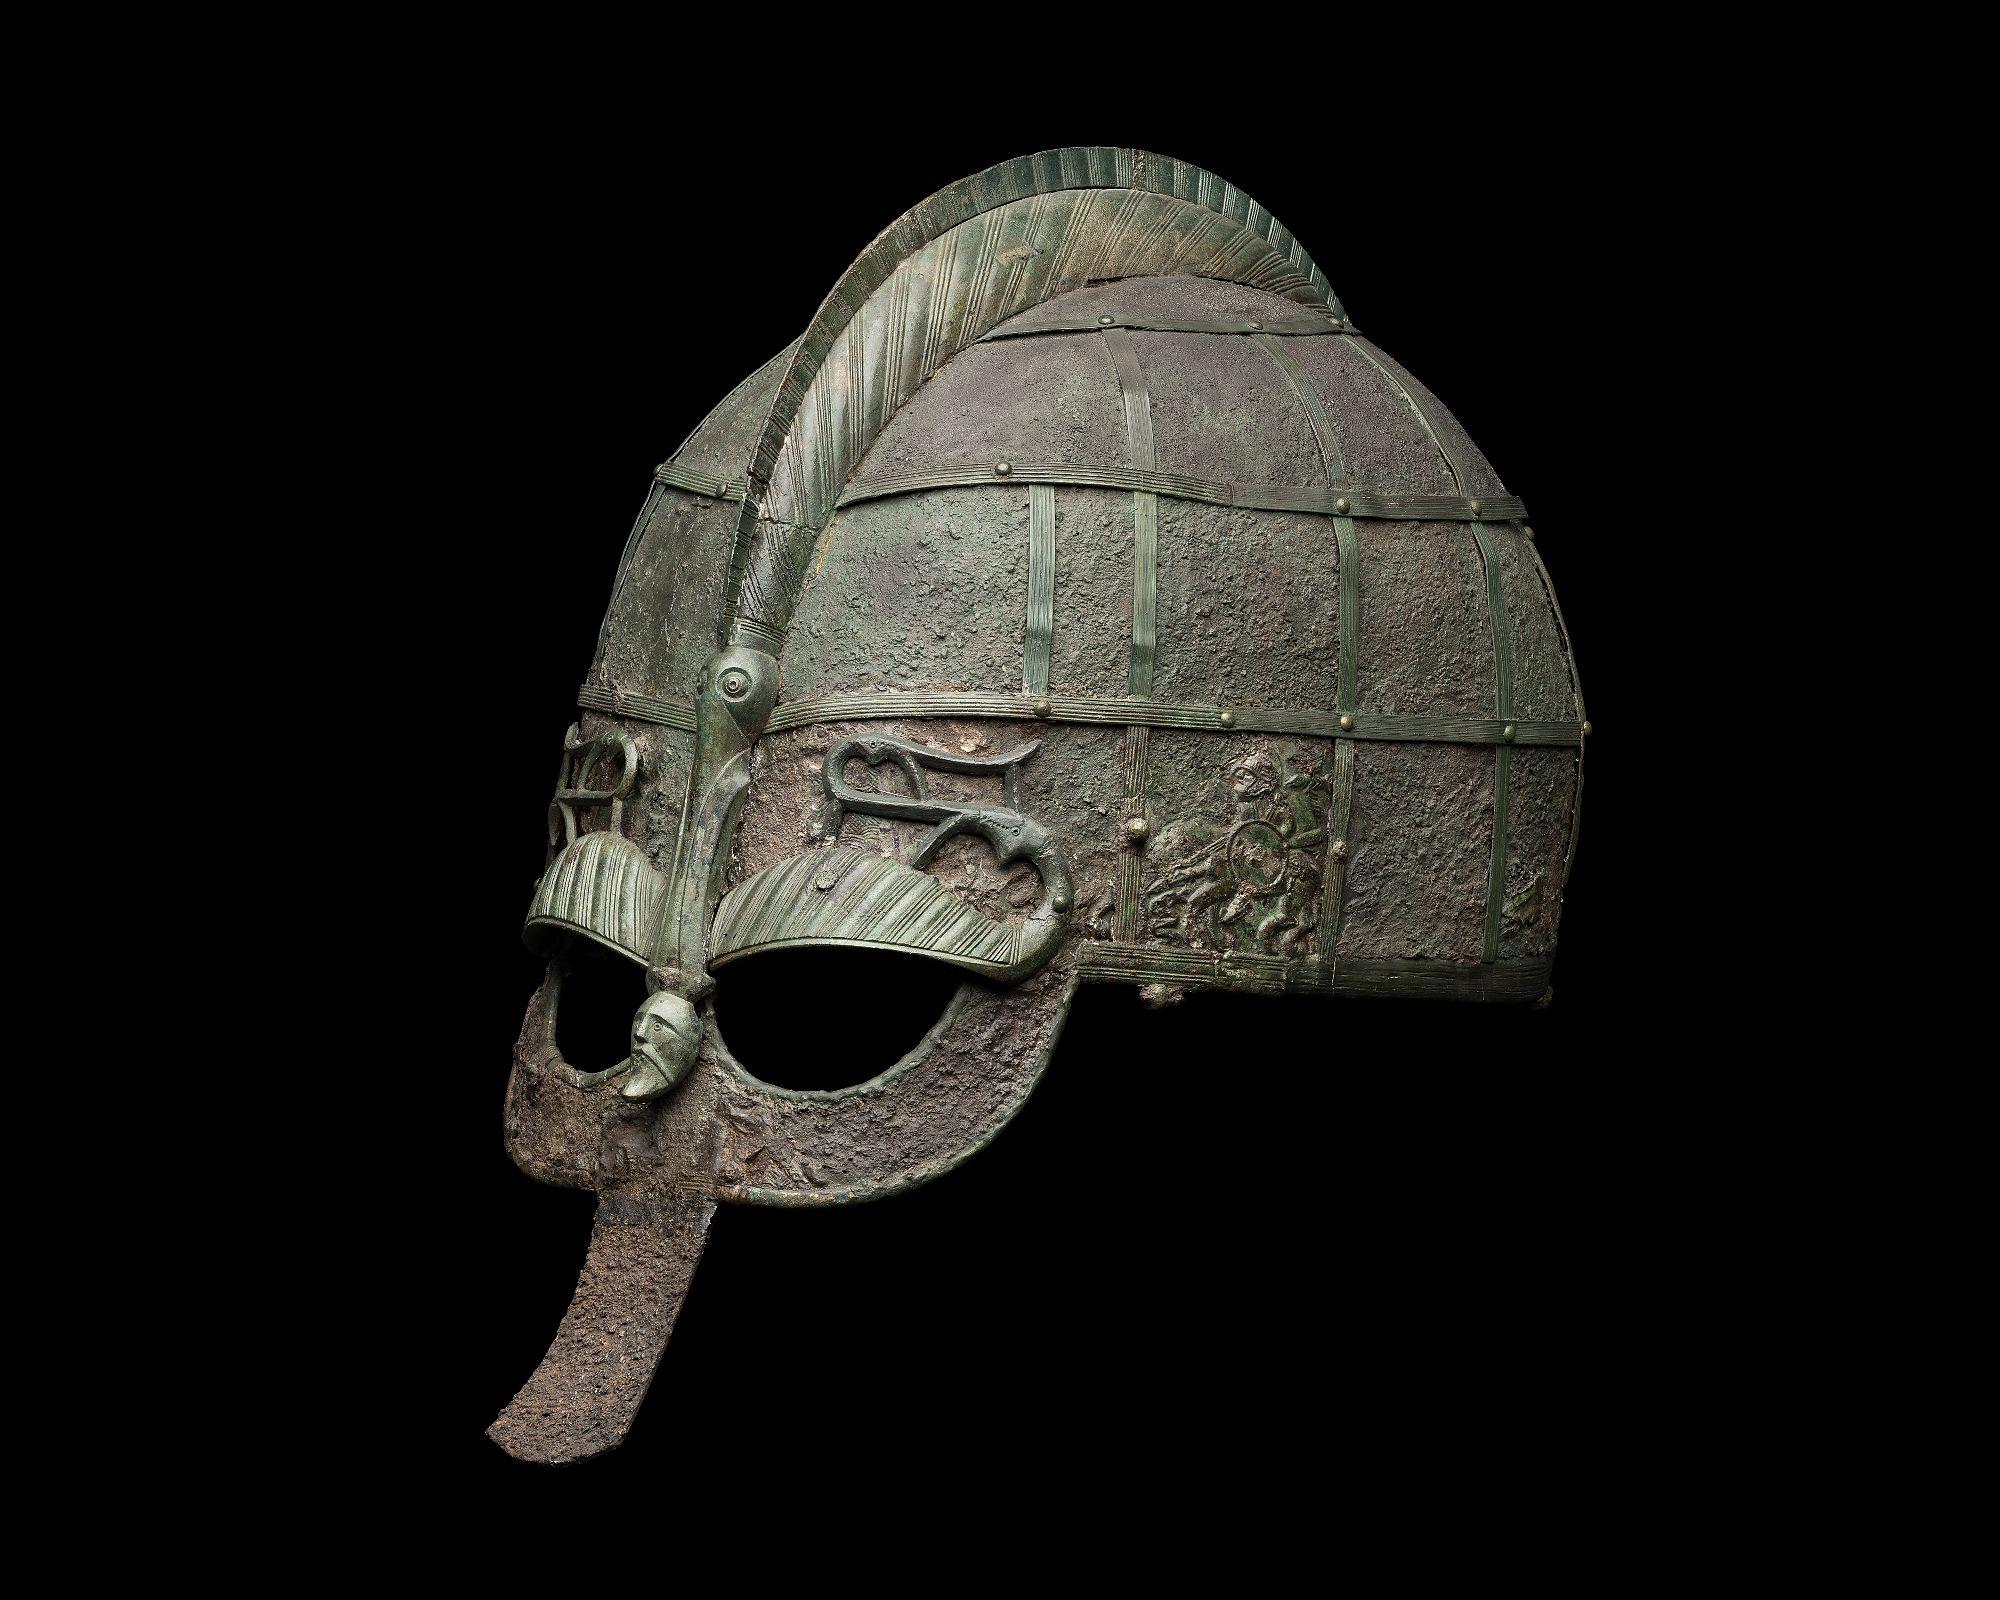 45 bsta bilderna p Vendel period clothing | Viking